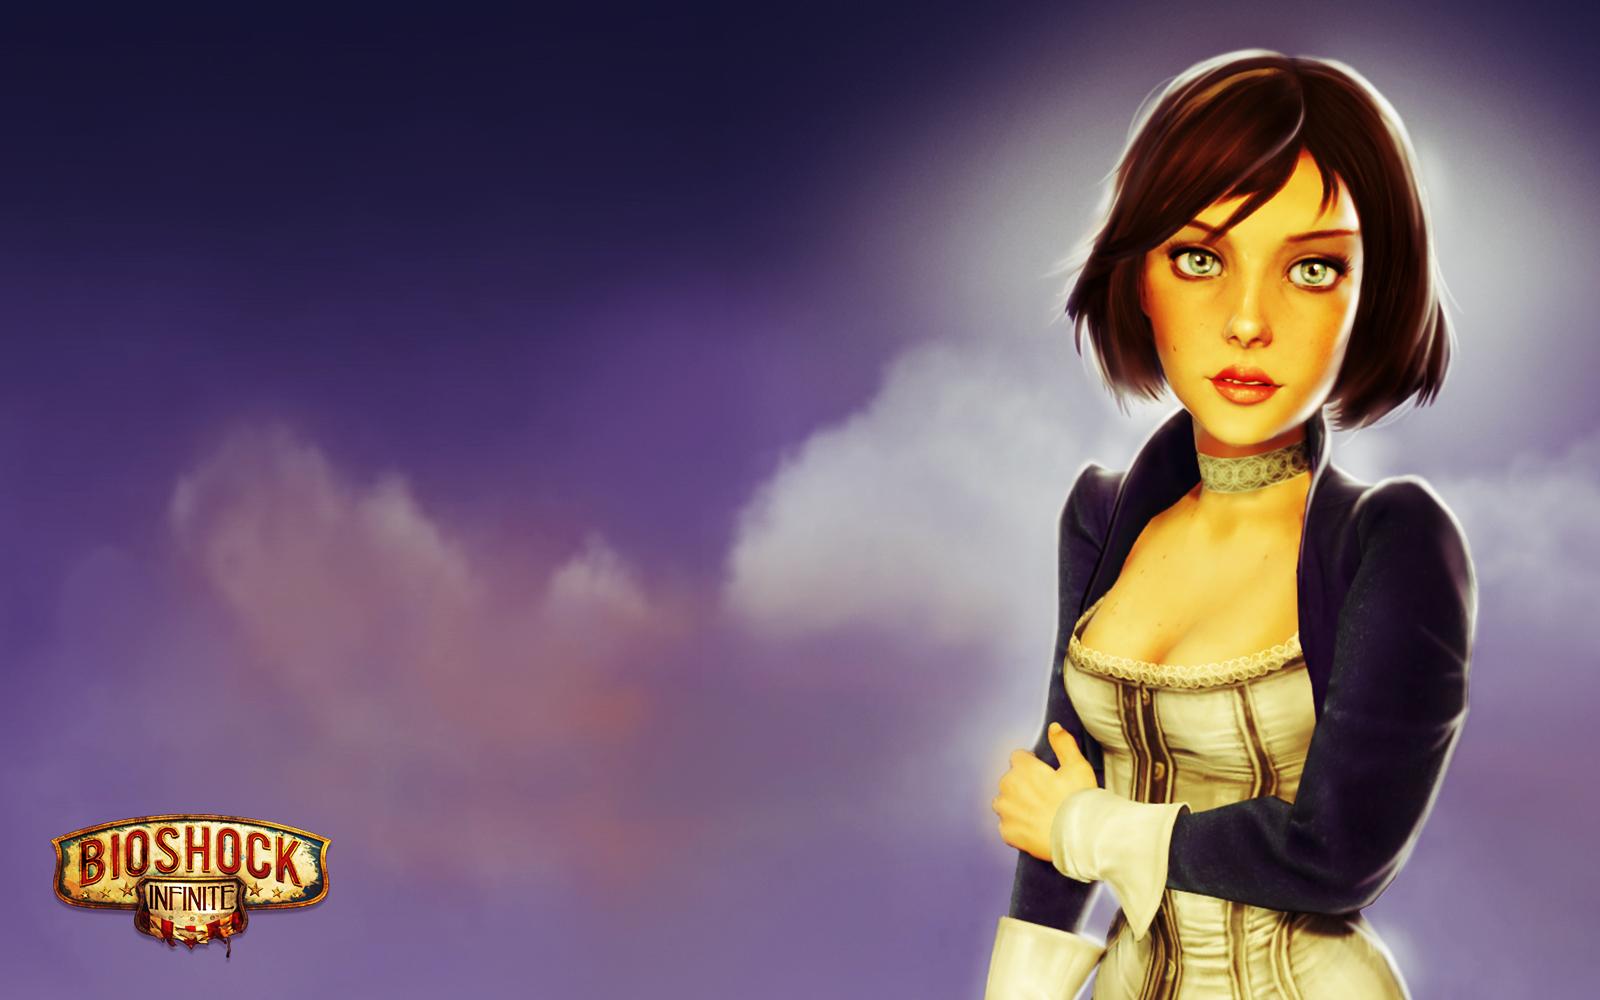 http://2.bp.blogspot.com/-fPwbdYfgyBg/UJgGgF9c8LI/AAAAAAAAF0c/sNaDtM9634k/s1600/Bioshock-Infinite-Game-Character-Elizabeth-HD-Wallpaper_Vvallpaper.Net.jpg